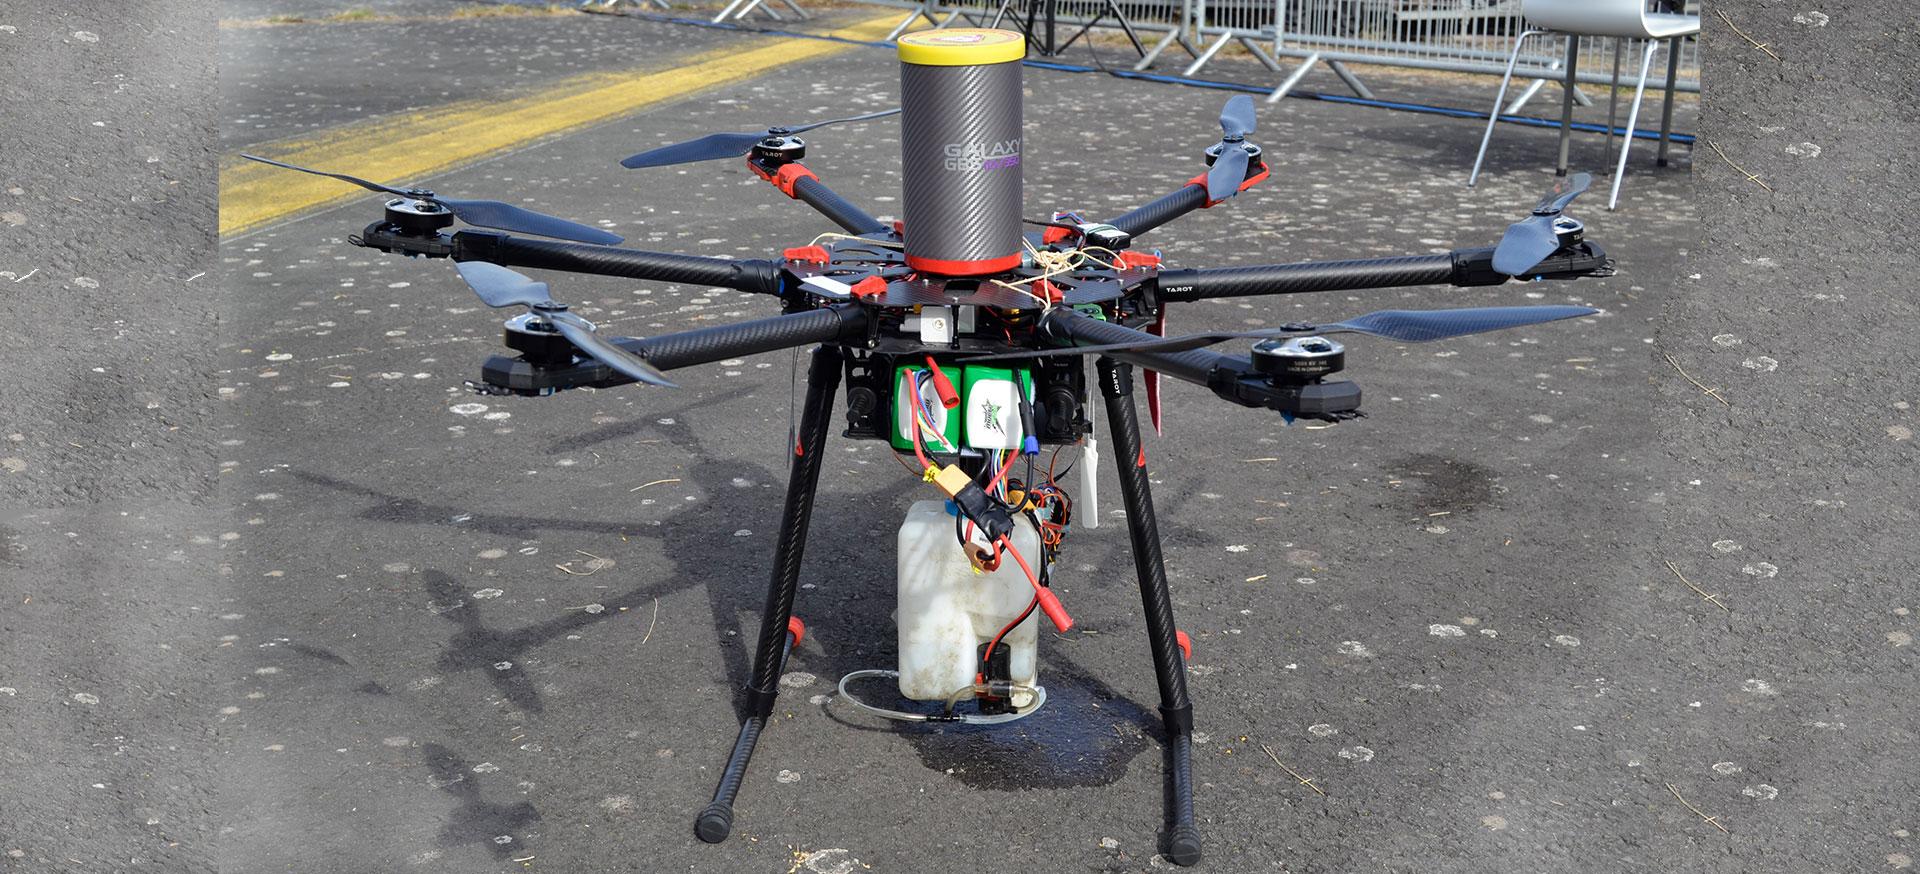 Commander drone android camera et avis avis drone blade 360